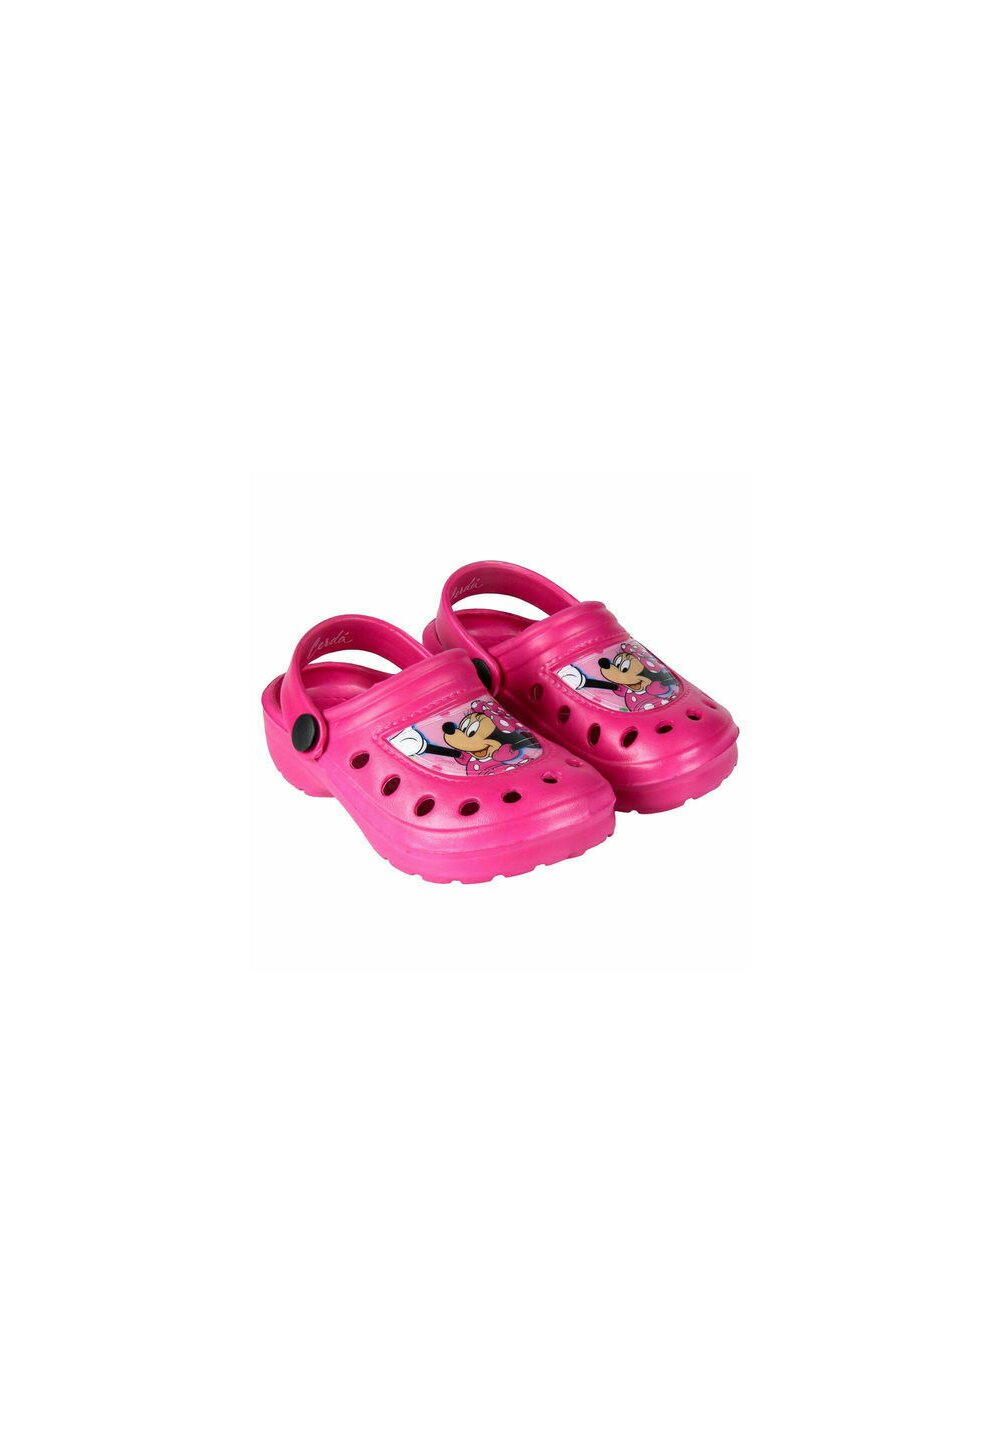 Saboti pentru plaja, Minnie Mouse cu fundita, roz imagine